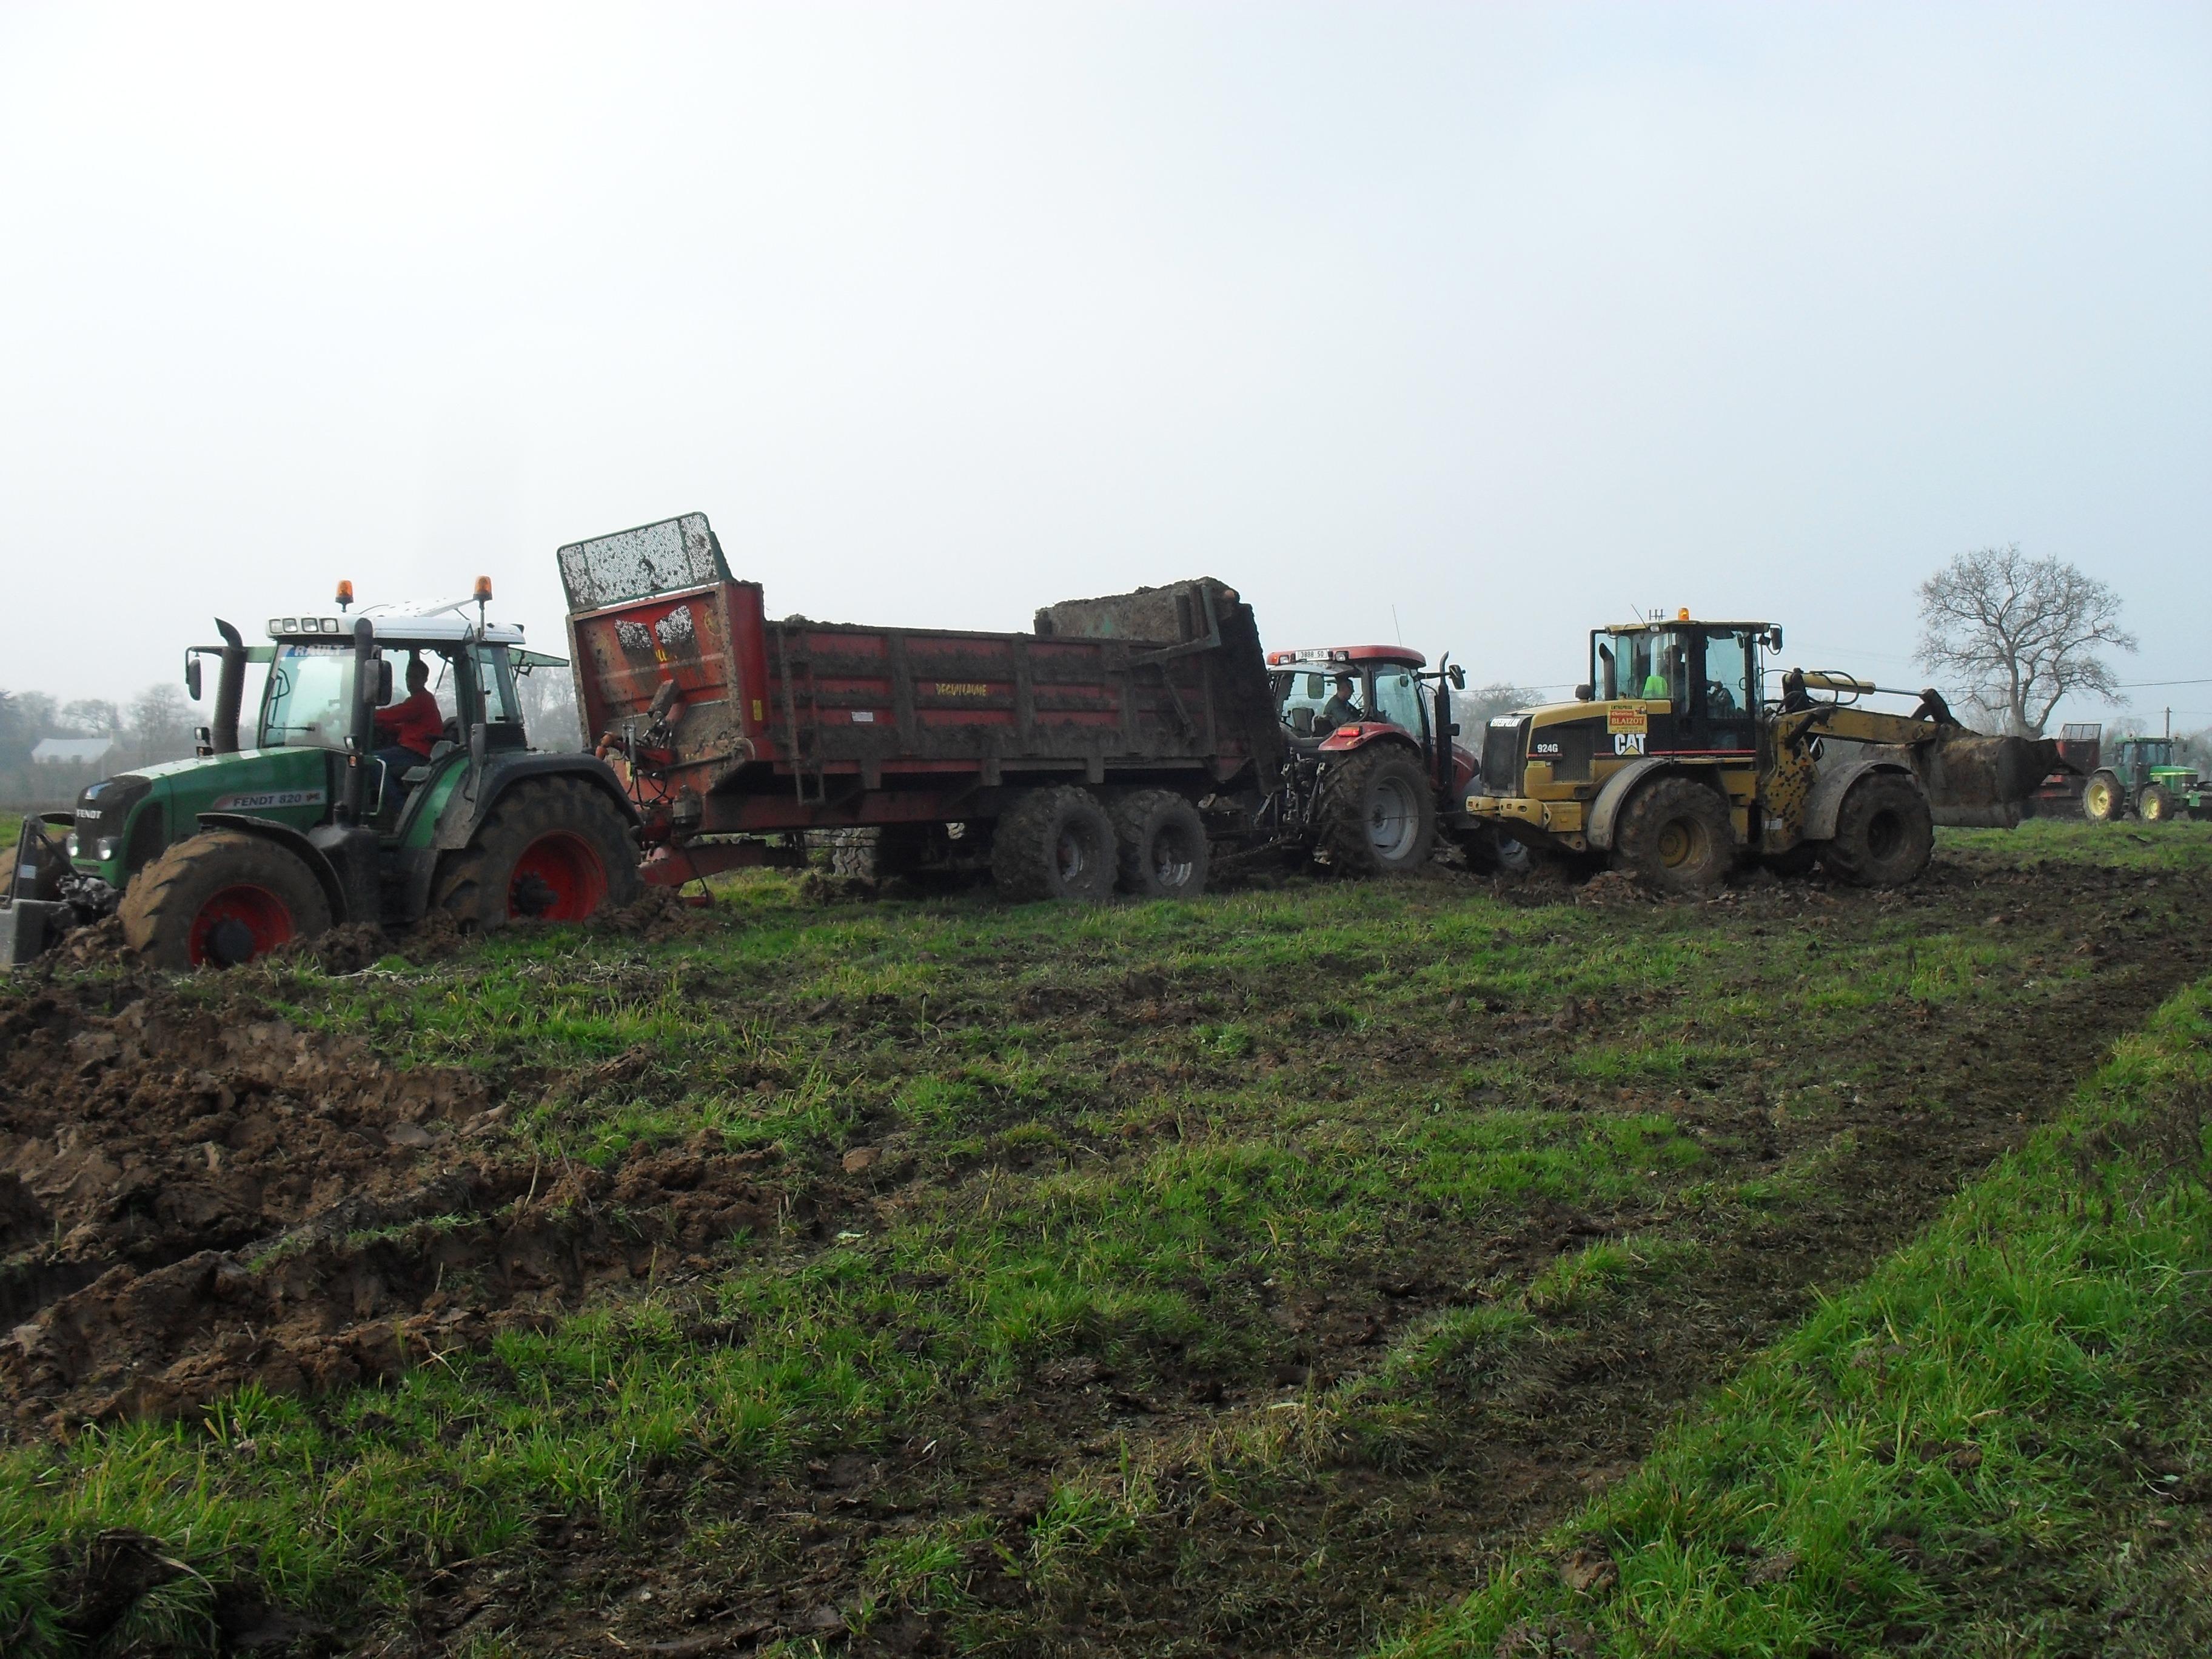 Kostenlose foto : Natur, Traktor, Feld, Bauernhof, Ernte, Fahrzeug ...